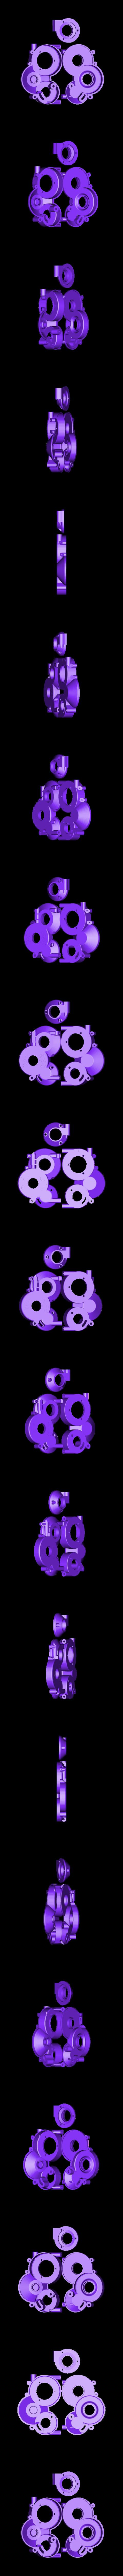 GBrear01-belt.STL Download free STL file Lynx - Fully 3D-printable 1/10 4wd buggy • Object to 3D print, tahustvedt